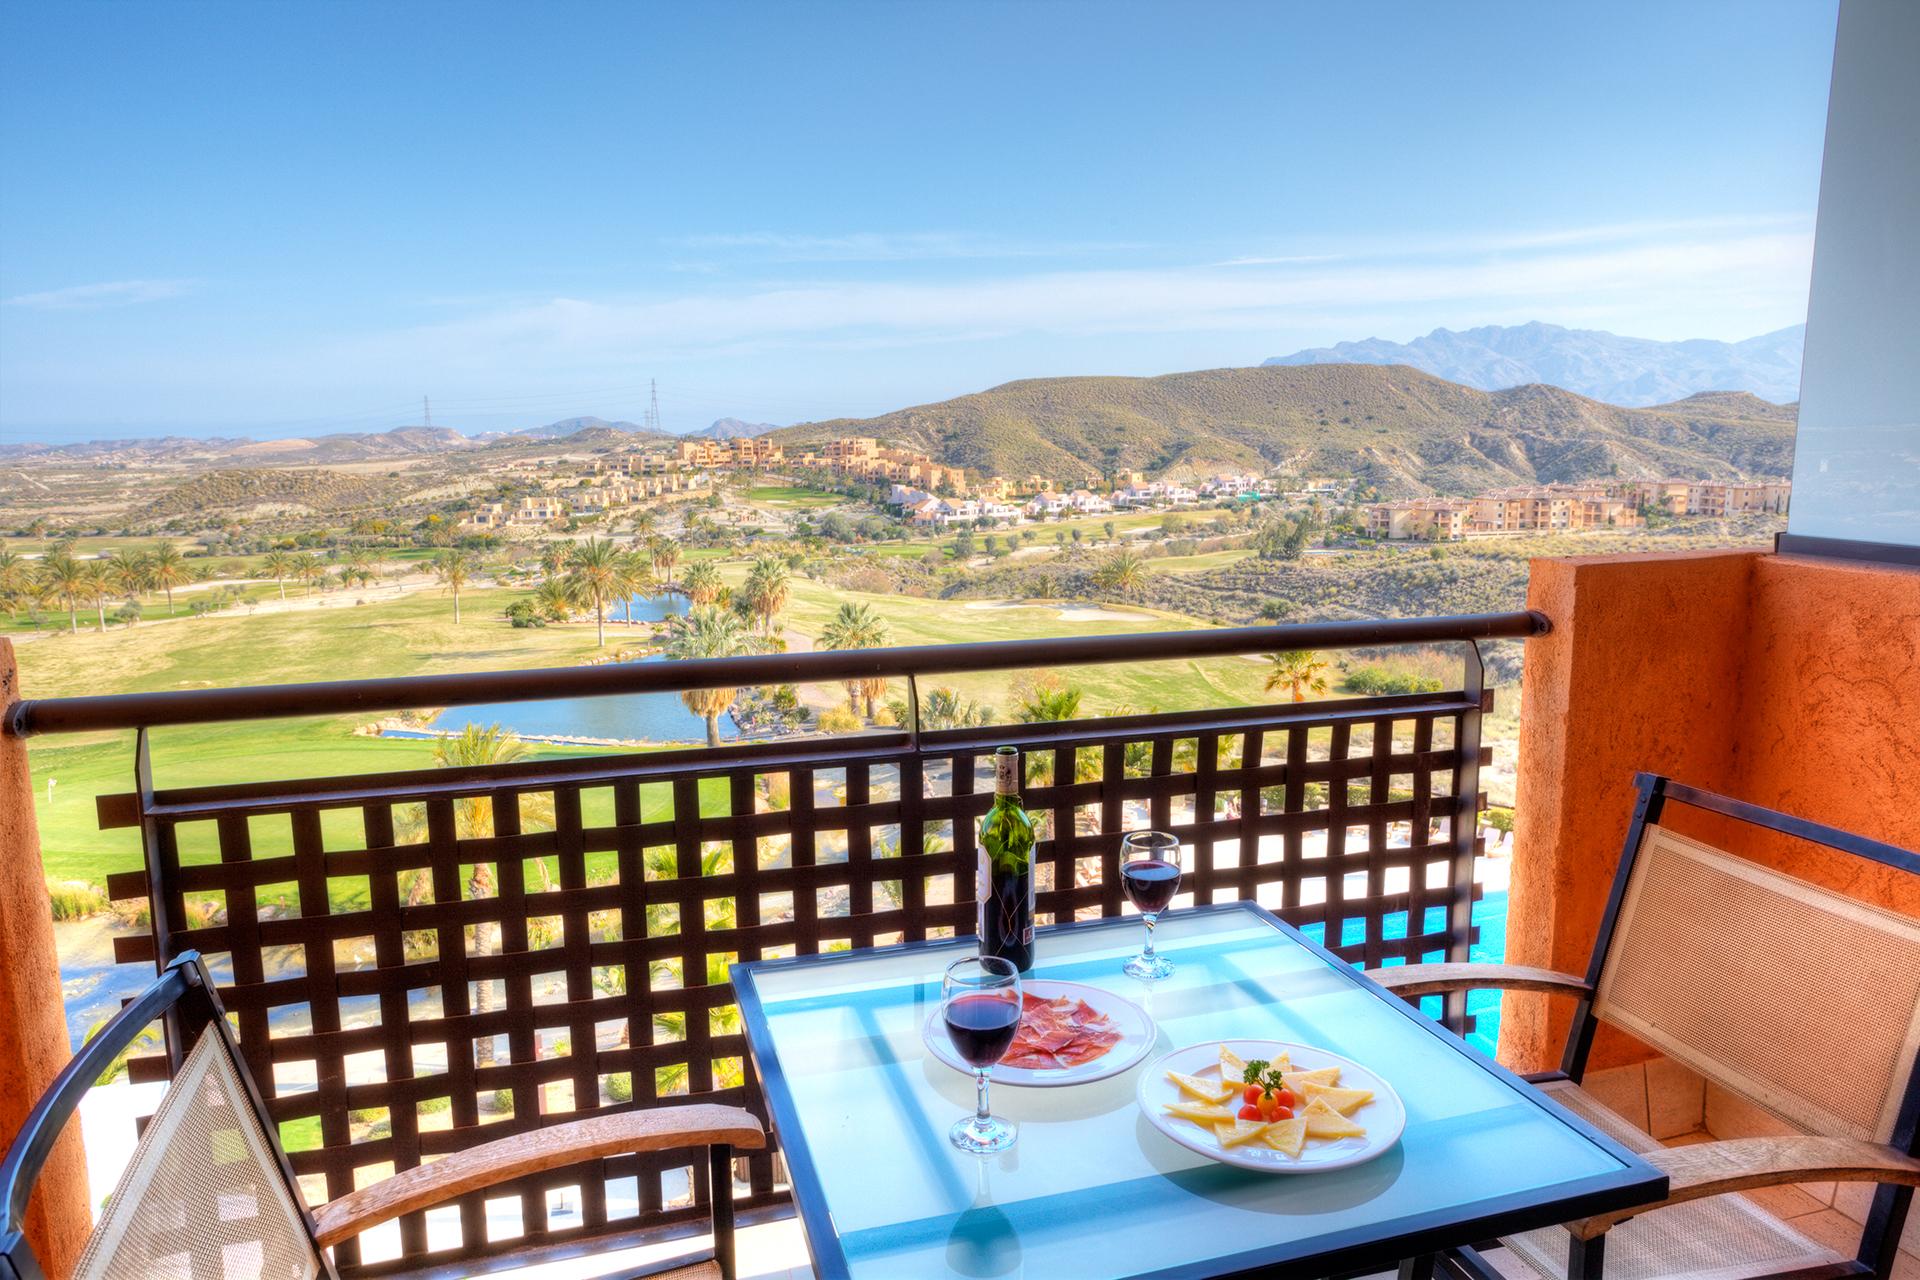 Golf-Expedition-Golf-reizen-Spanje-Regio-Valencia-Valle-Del-este-Golf-resort-double-bedroom-balcony